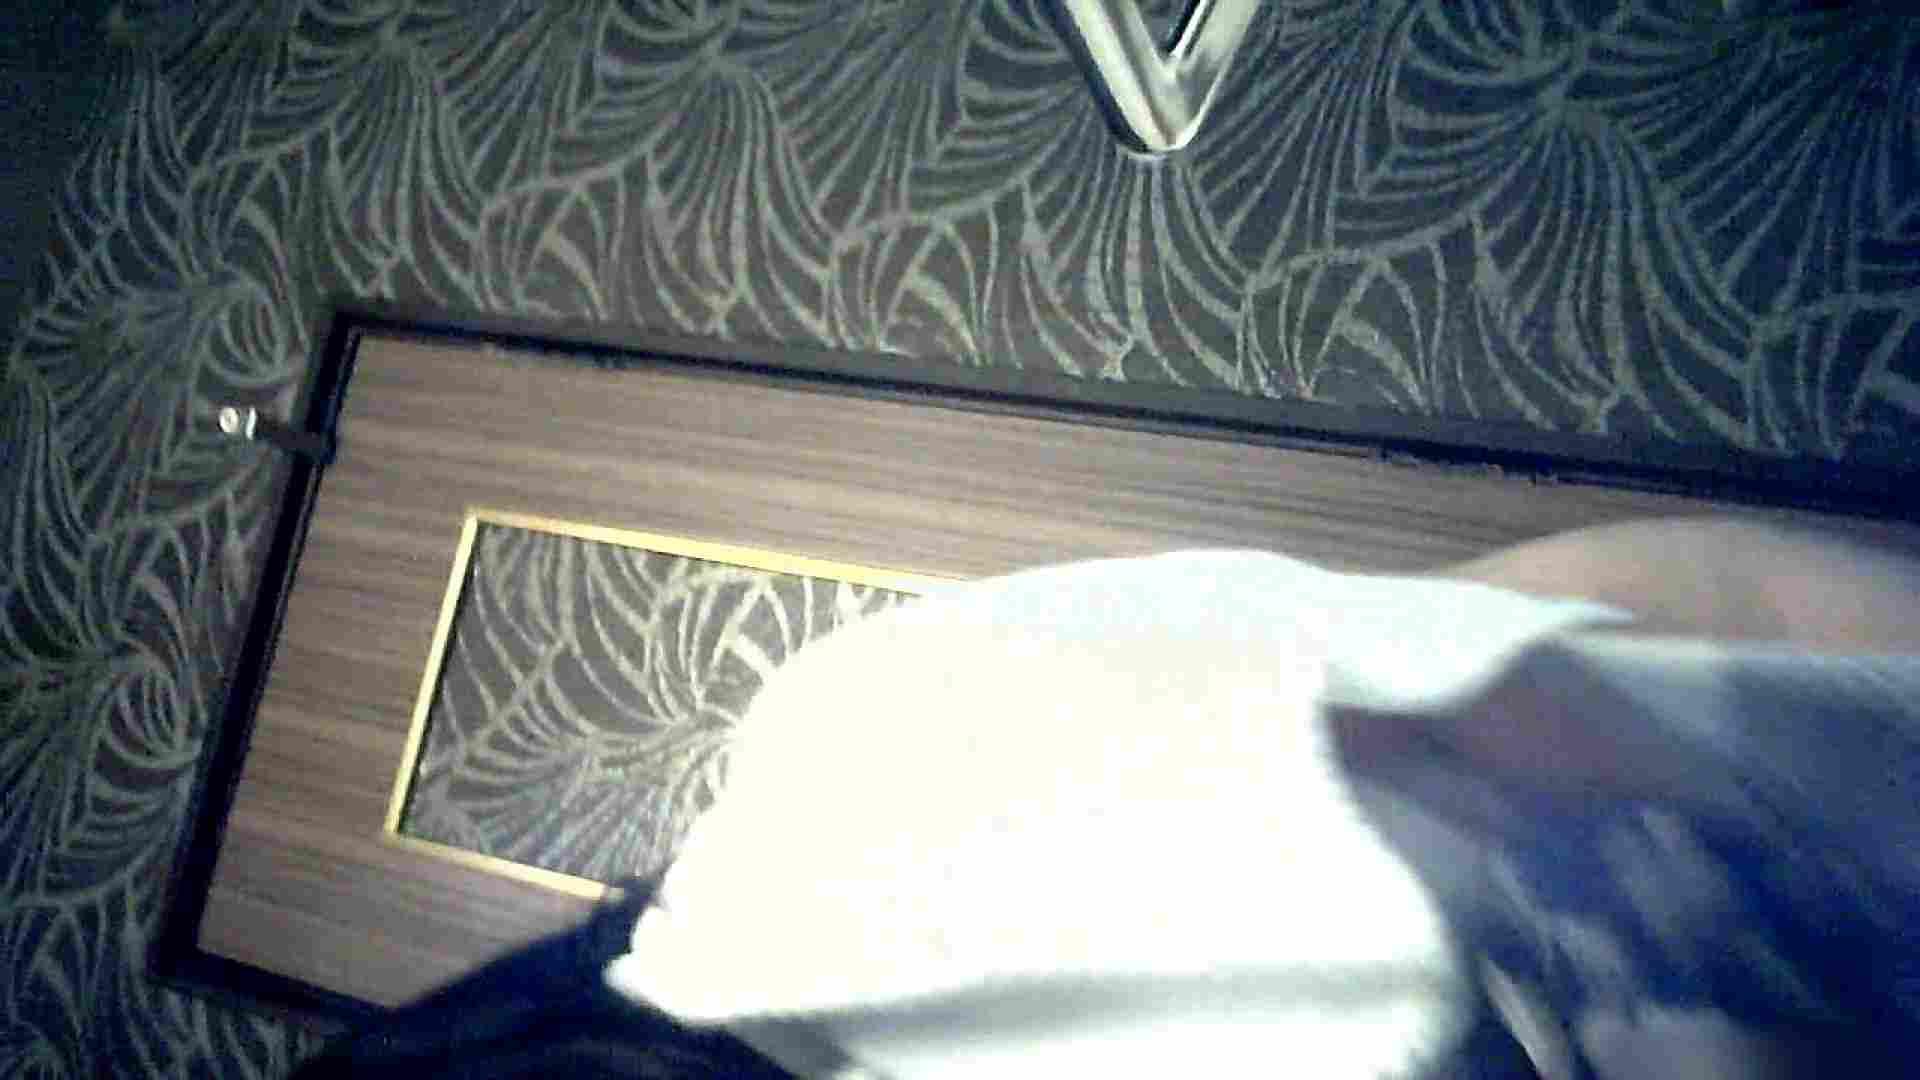 ▲2017_05位▲ 学園アイドル美人女子大生!❶4人厳選詰合せVol.49 人気作   女子大生  113画像 64